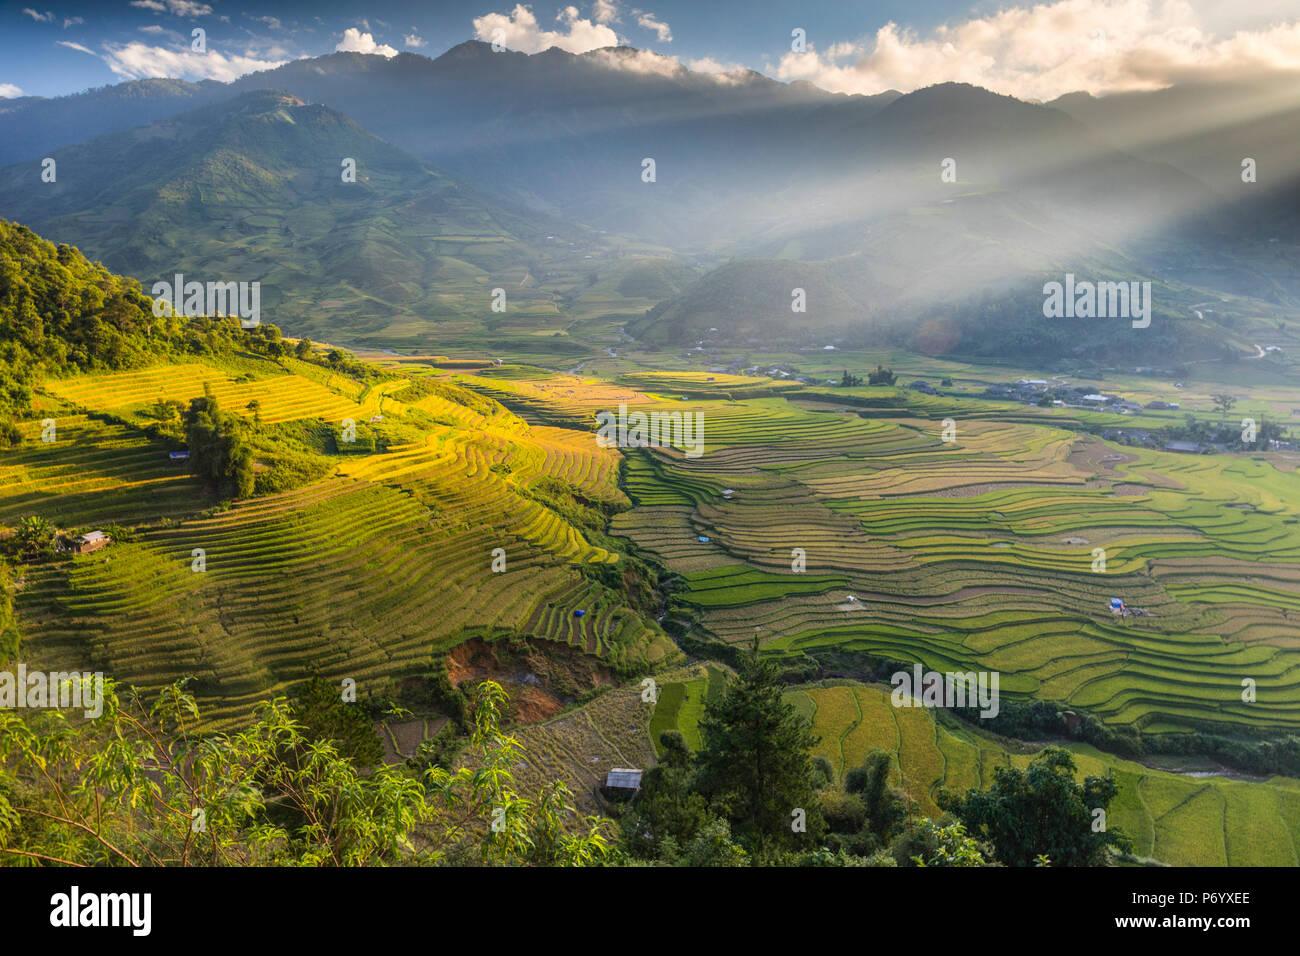 Sun beams over the mountains surrounding the rice terraces at Tu Le, Yen Bai Province, Vietnam, South-East Asia Stock Photo